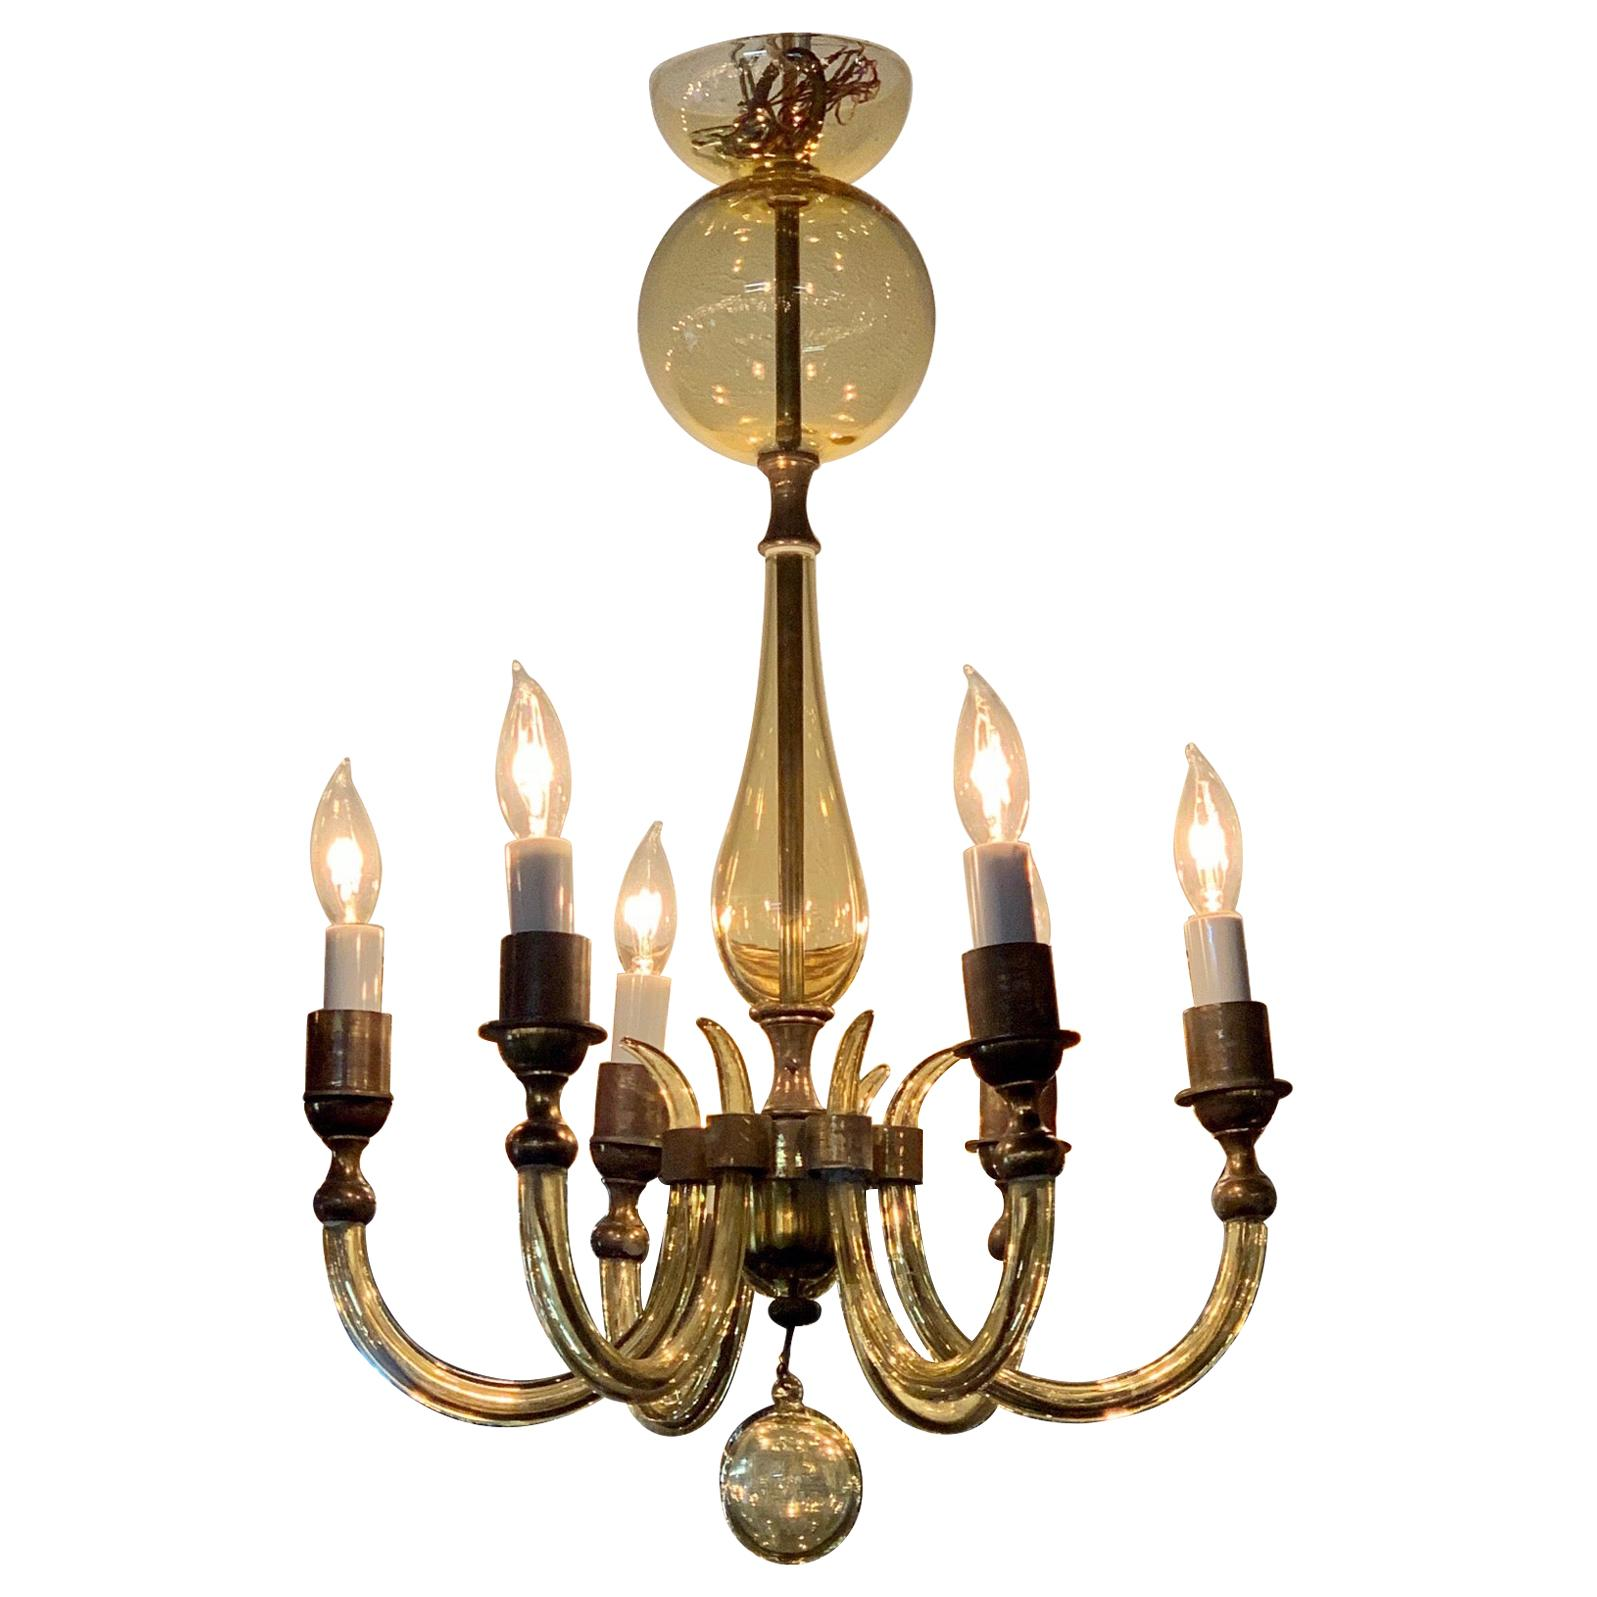 Vintage Italian Murano Glass and Brass 6-Light Chandelier